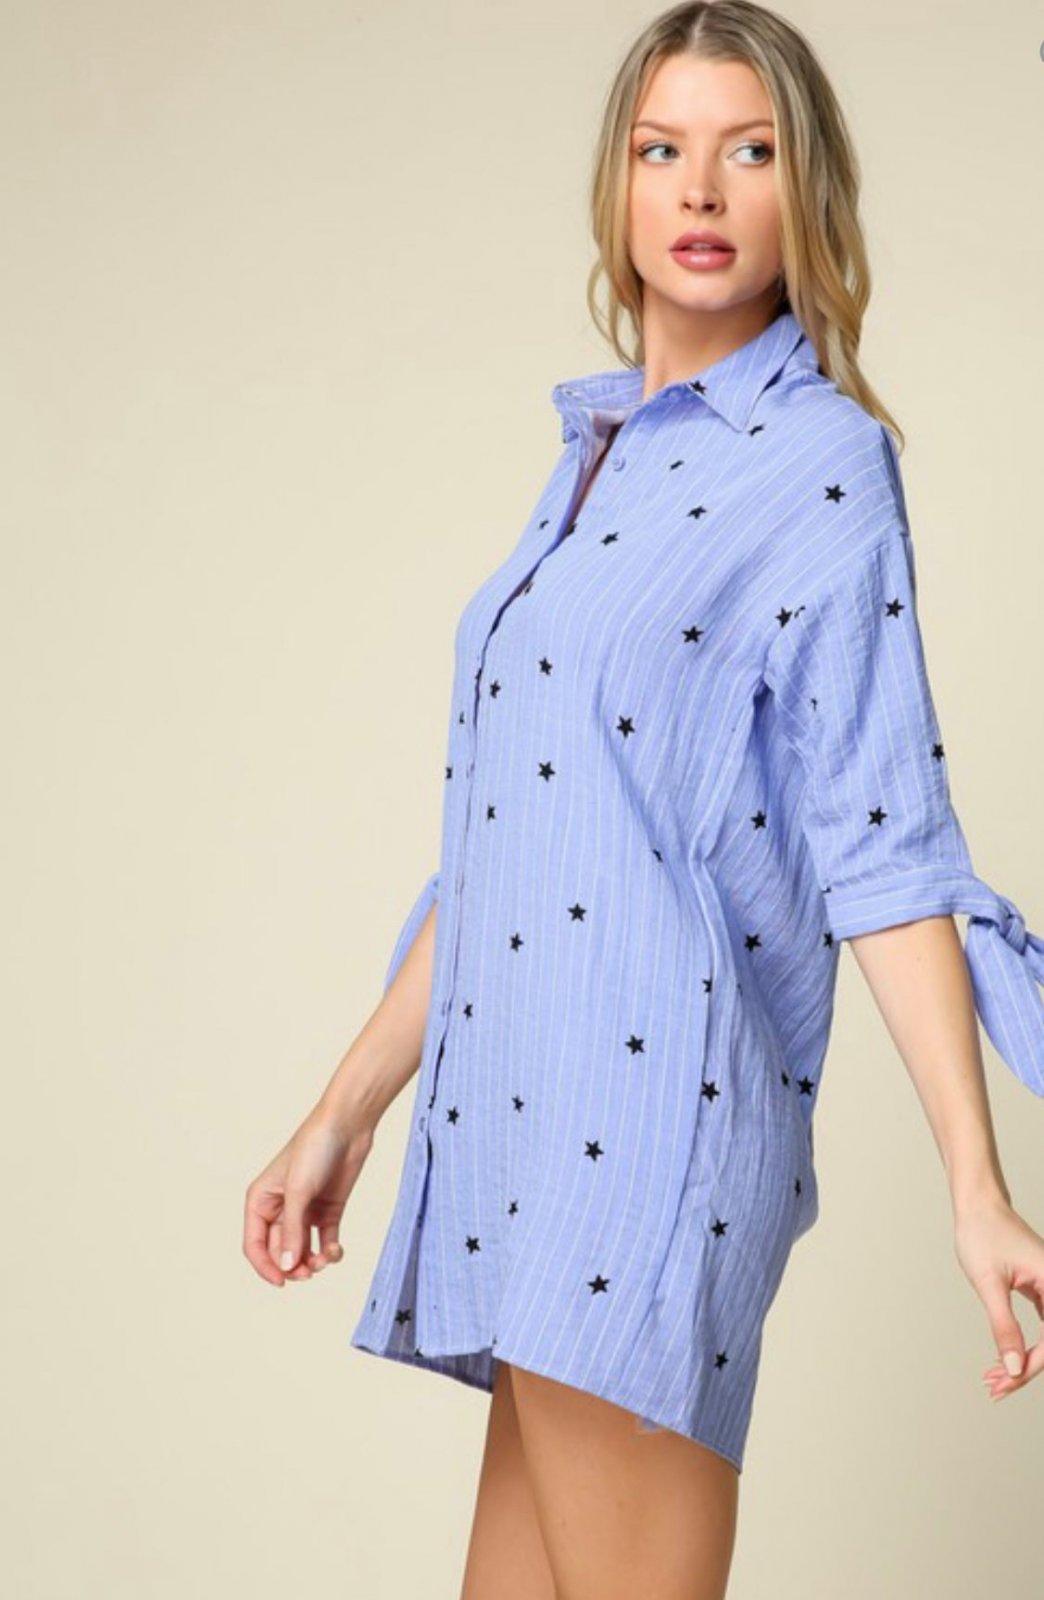 Stripe/Star Shirt Dress